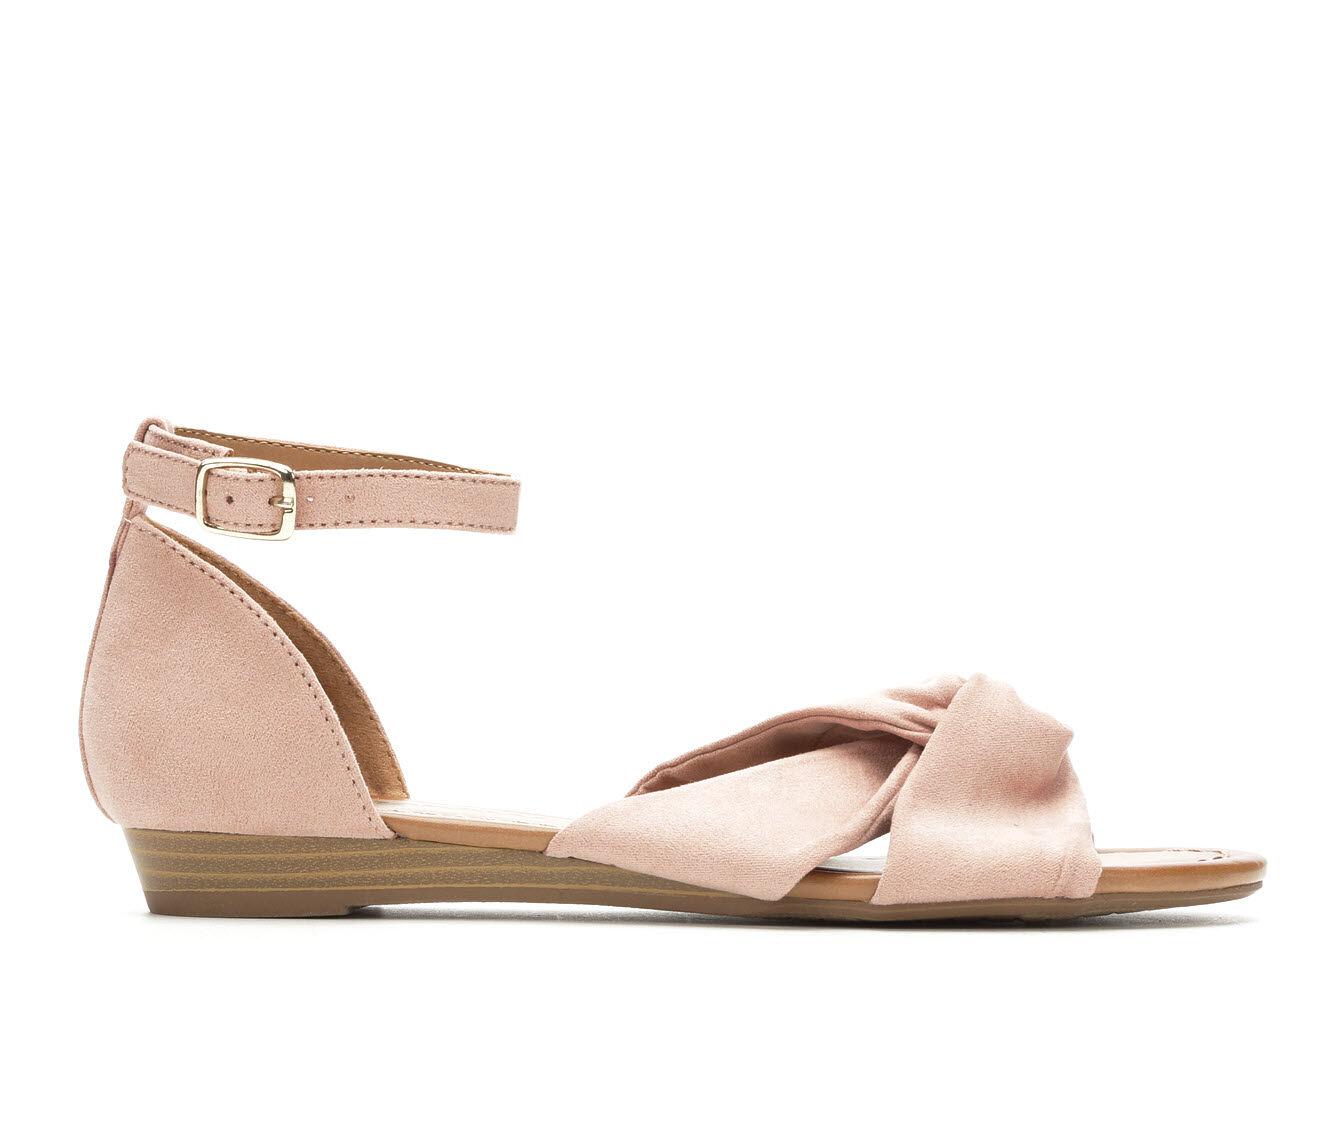 Outlet UK Women's Makalu Natty Strappy Sandals Mauve